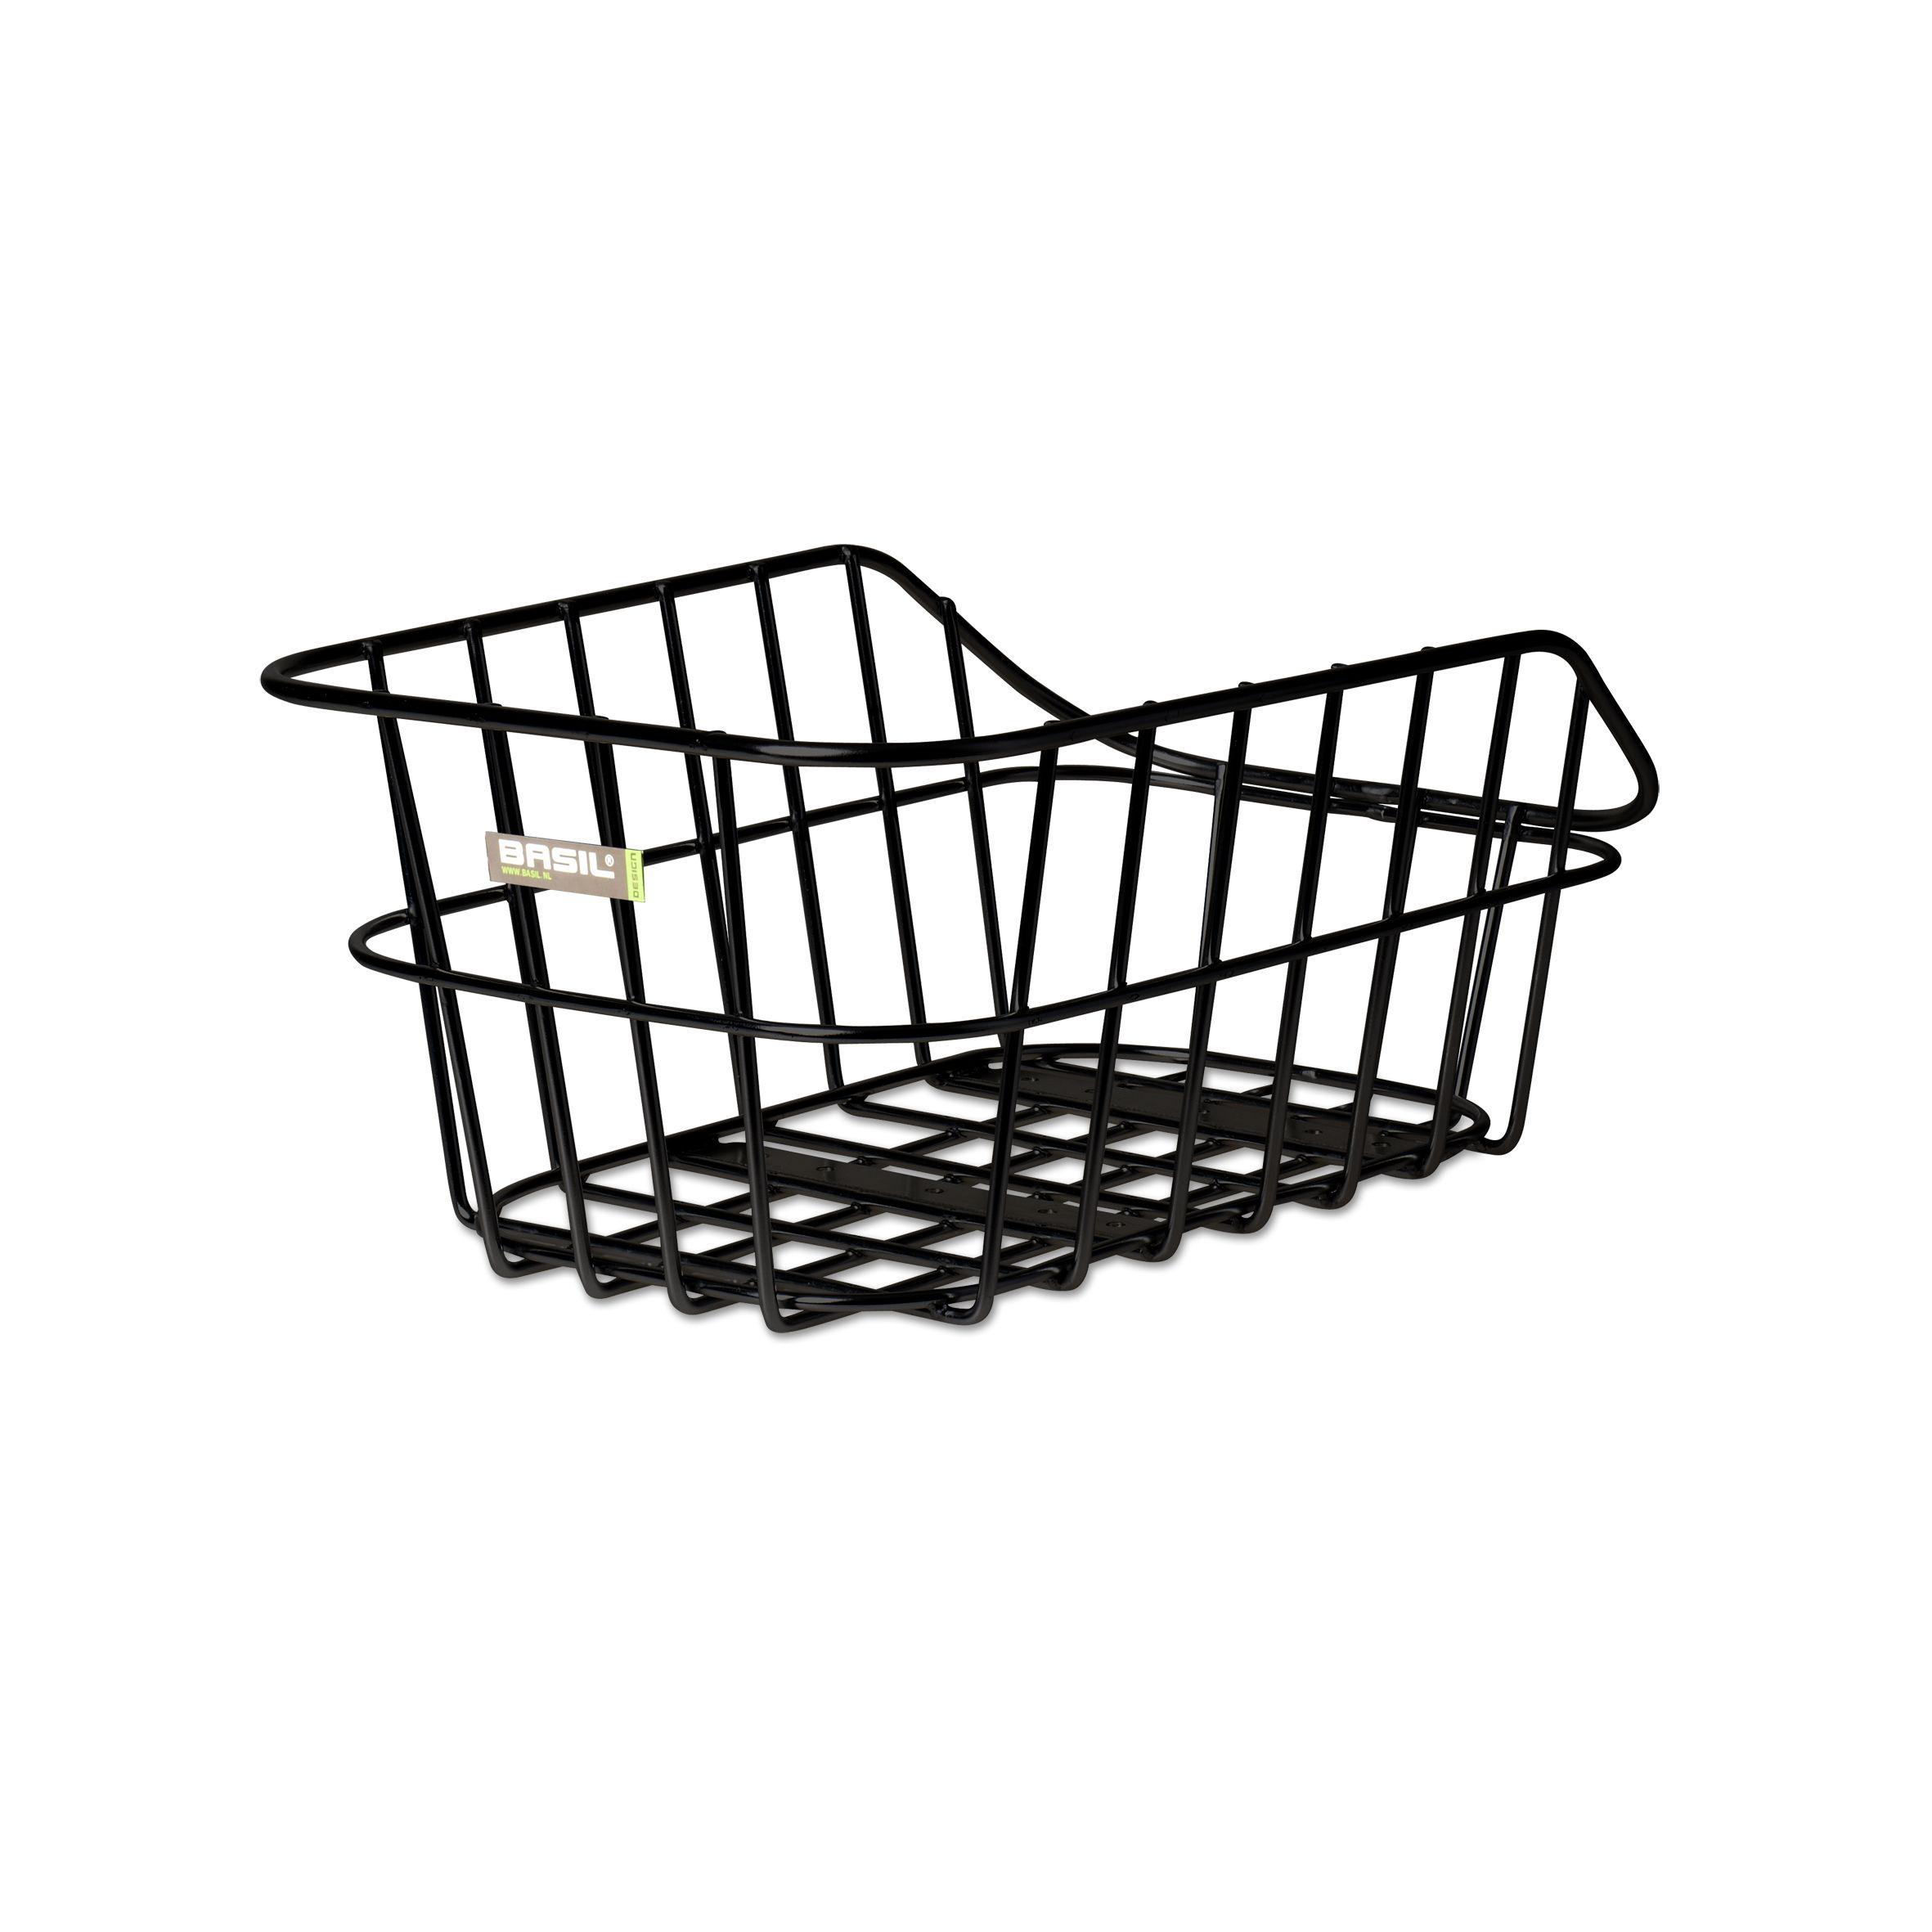 Ew 36 Rear Basket